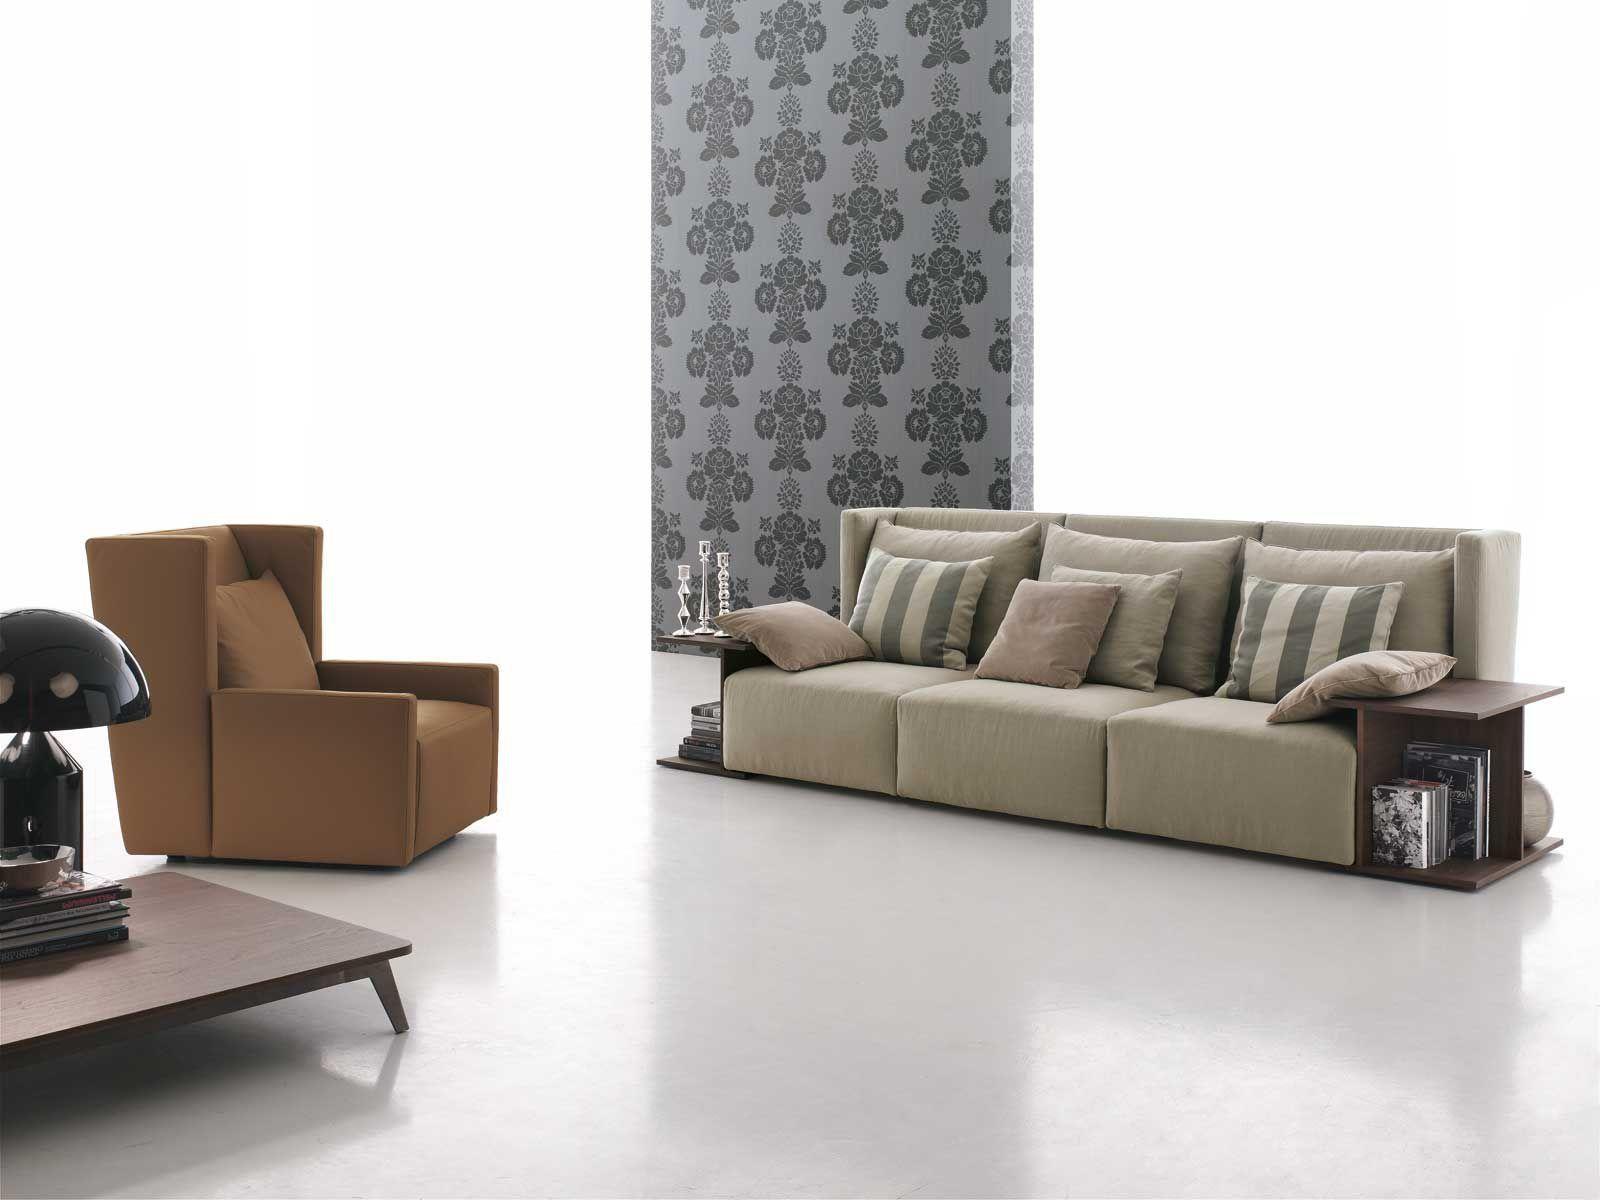 Modular Sofa / Contemporary / Fabric / 3 Seater – Club – Gruppo With Regard To Contemporary Fabric Sofas (Image 15 of 20)